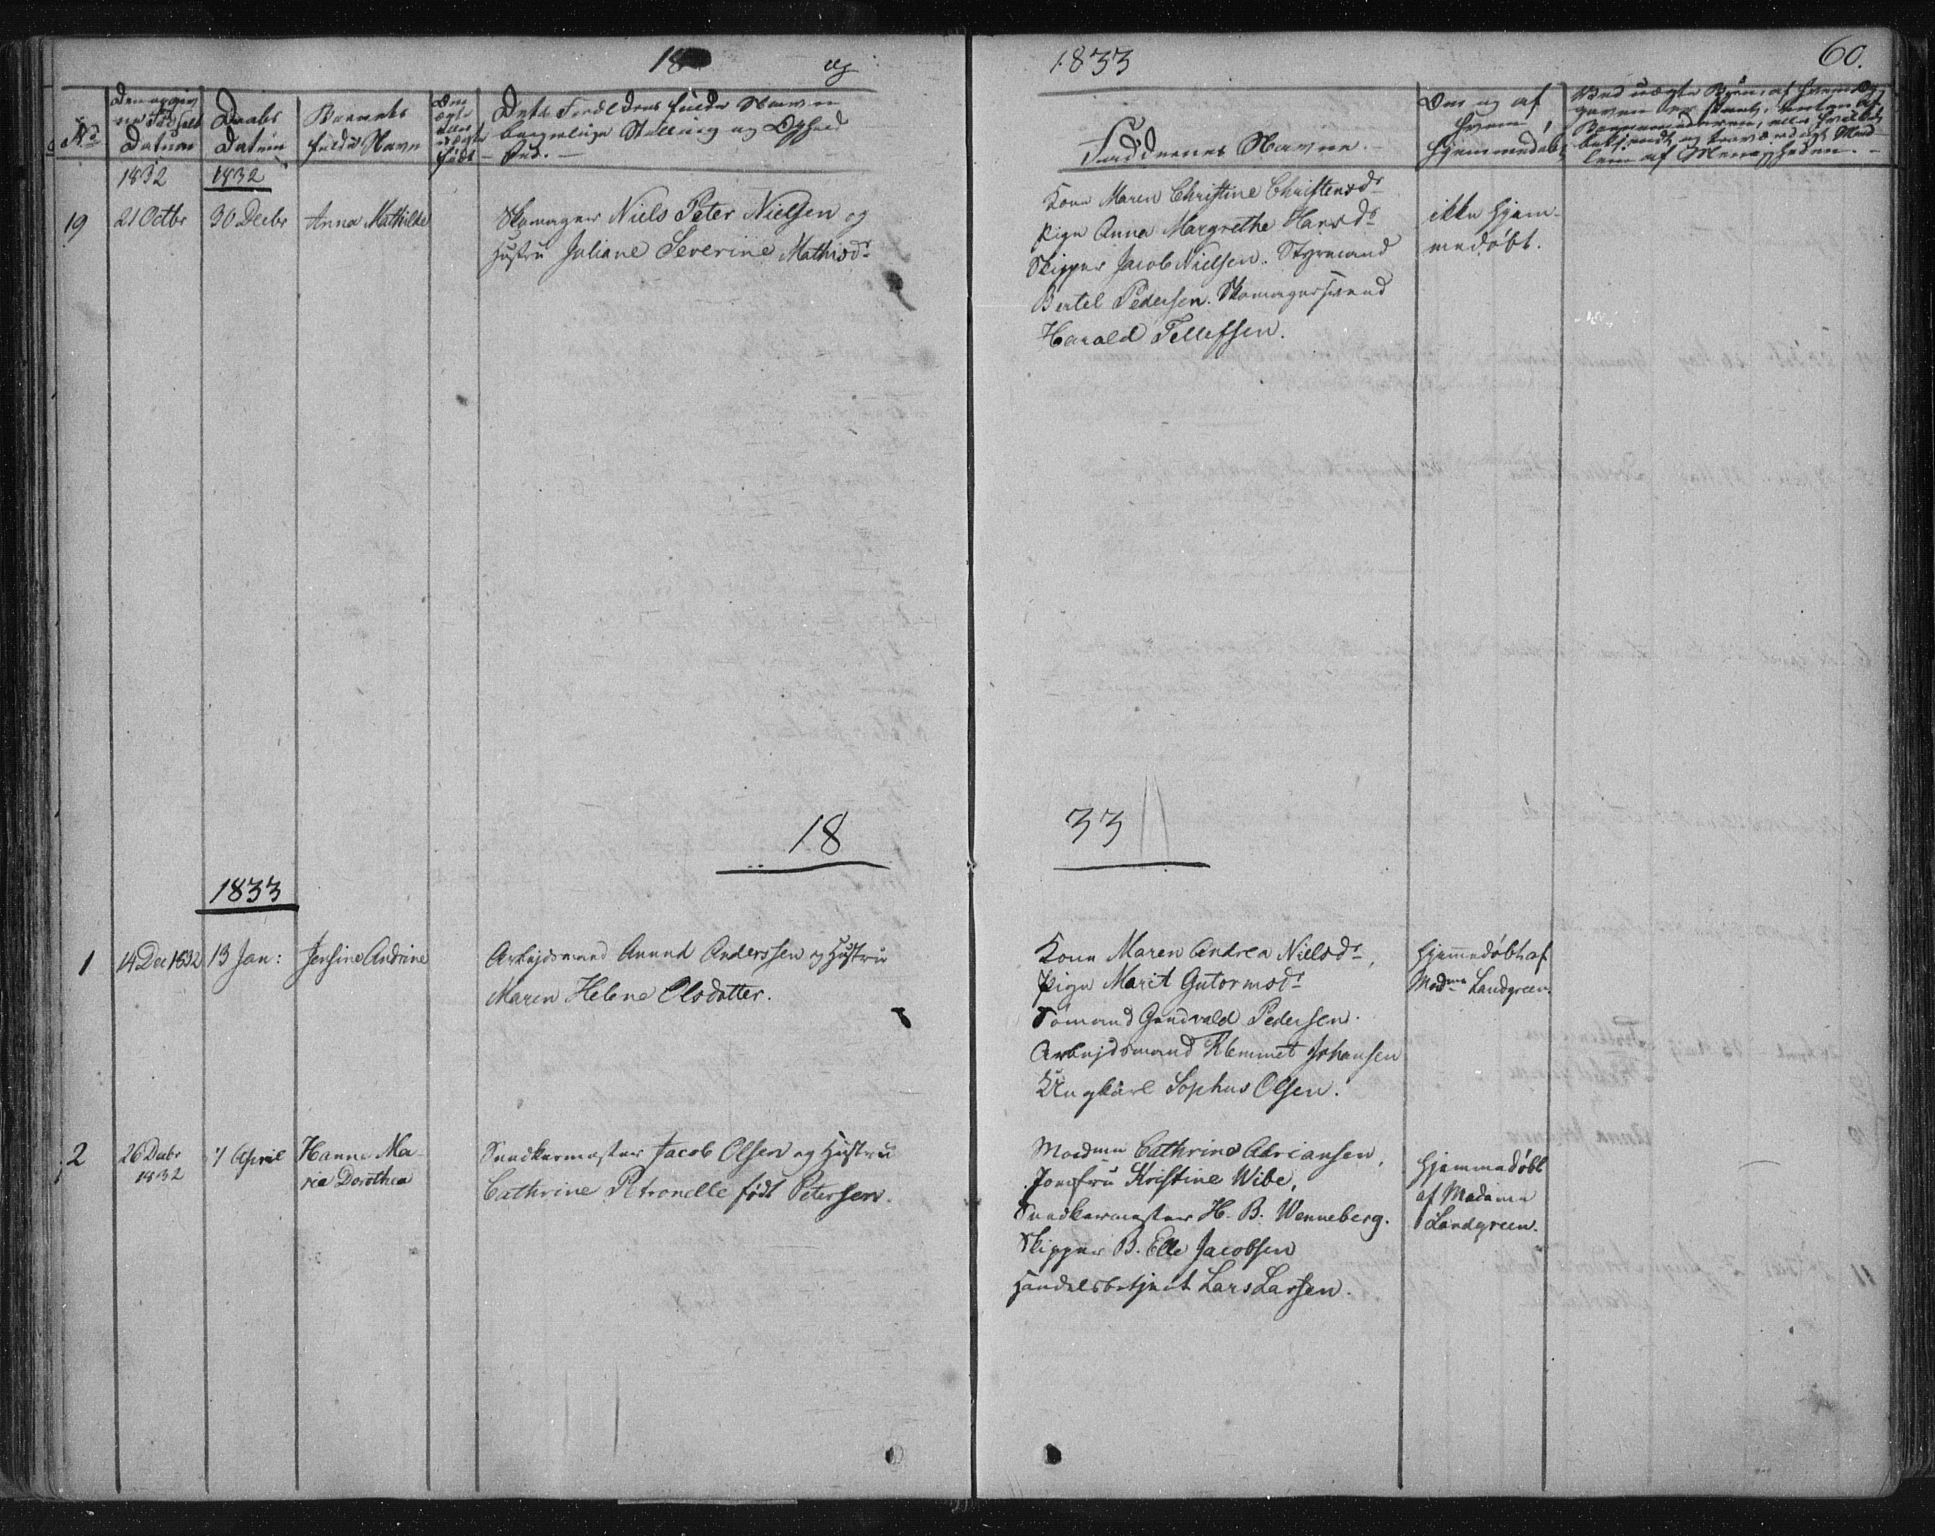 SAKO, Kragerø kirkebøker, F/Fa/L0005: Ministerialbok nr. 5, 1832-1847, s. 60